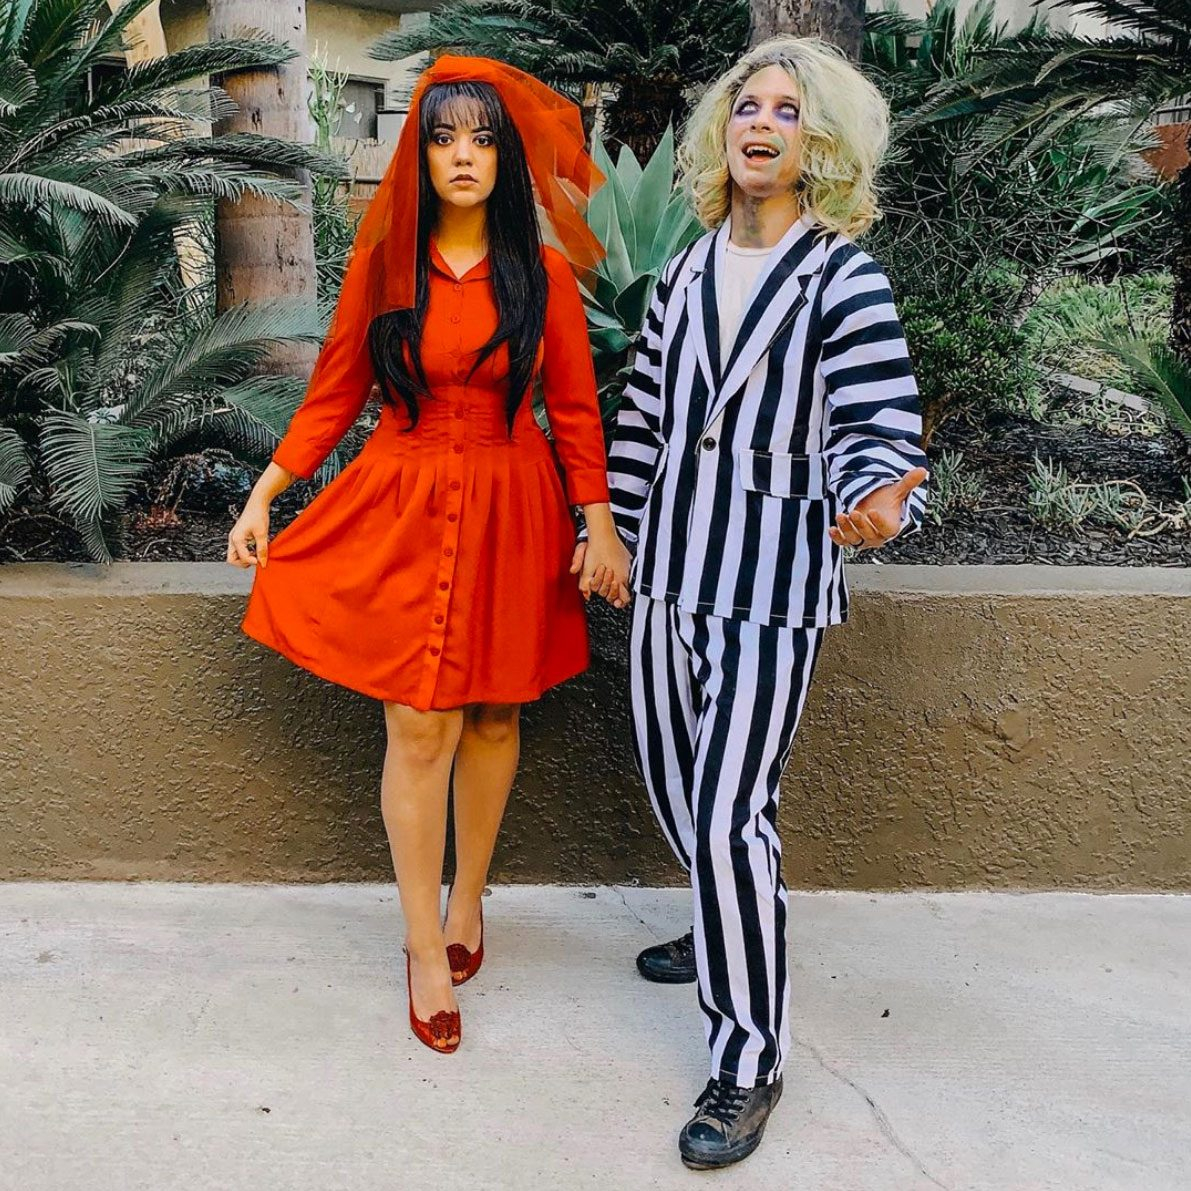 Beetlejuice and Lydia Deetz couples halloween costume